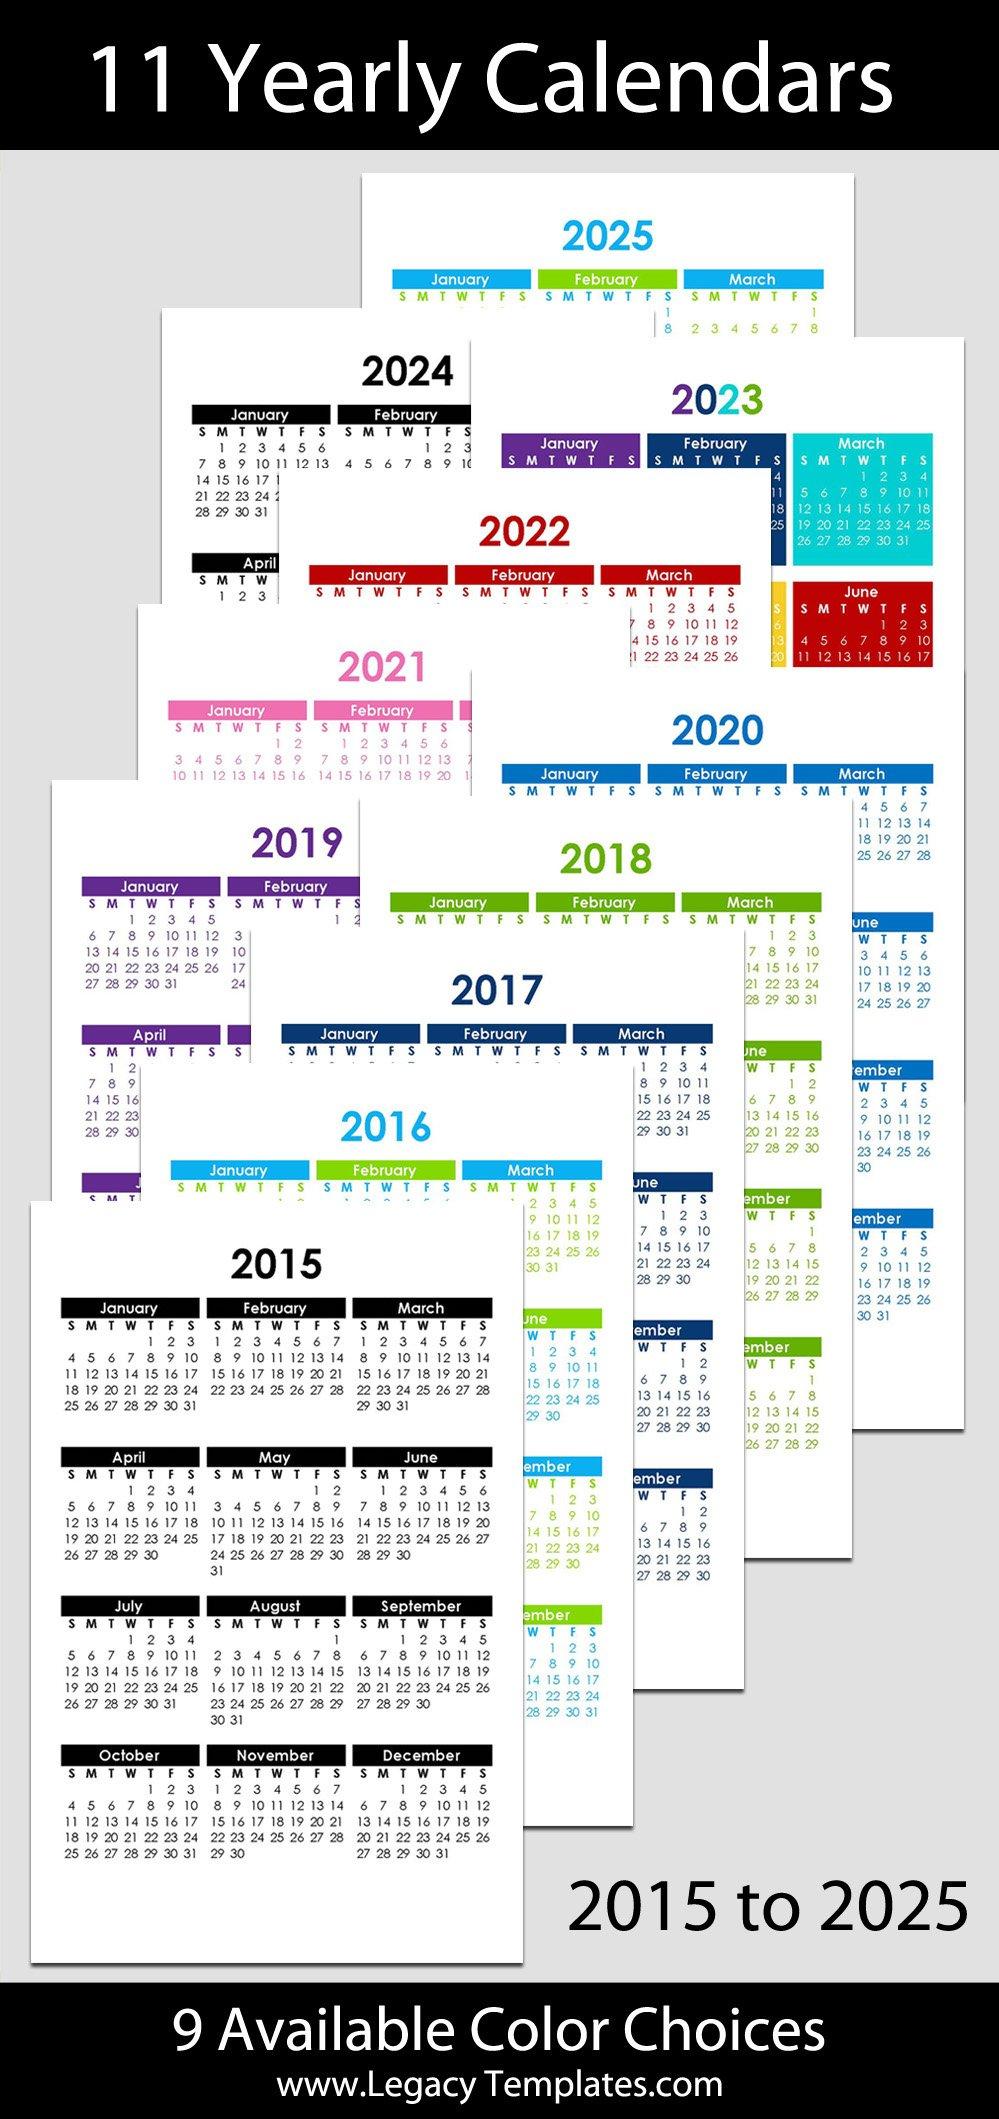 "2015 & 2025 Yearly Calendar – 5 1/2"" X 8 1/2"" | Legacy Free Printable Calendars 5 1/2 X 8 1/2"